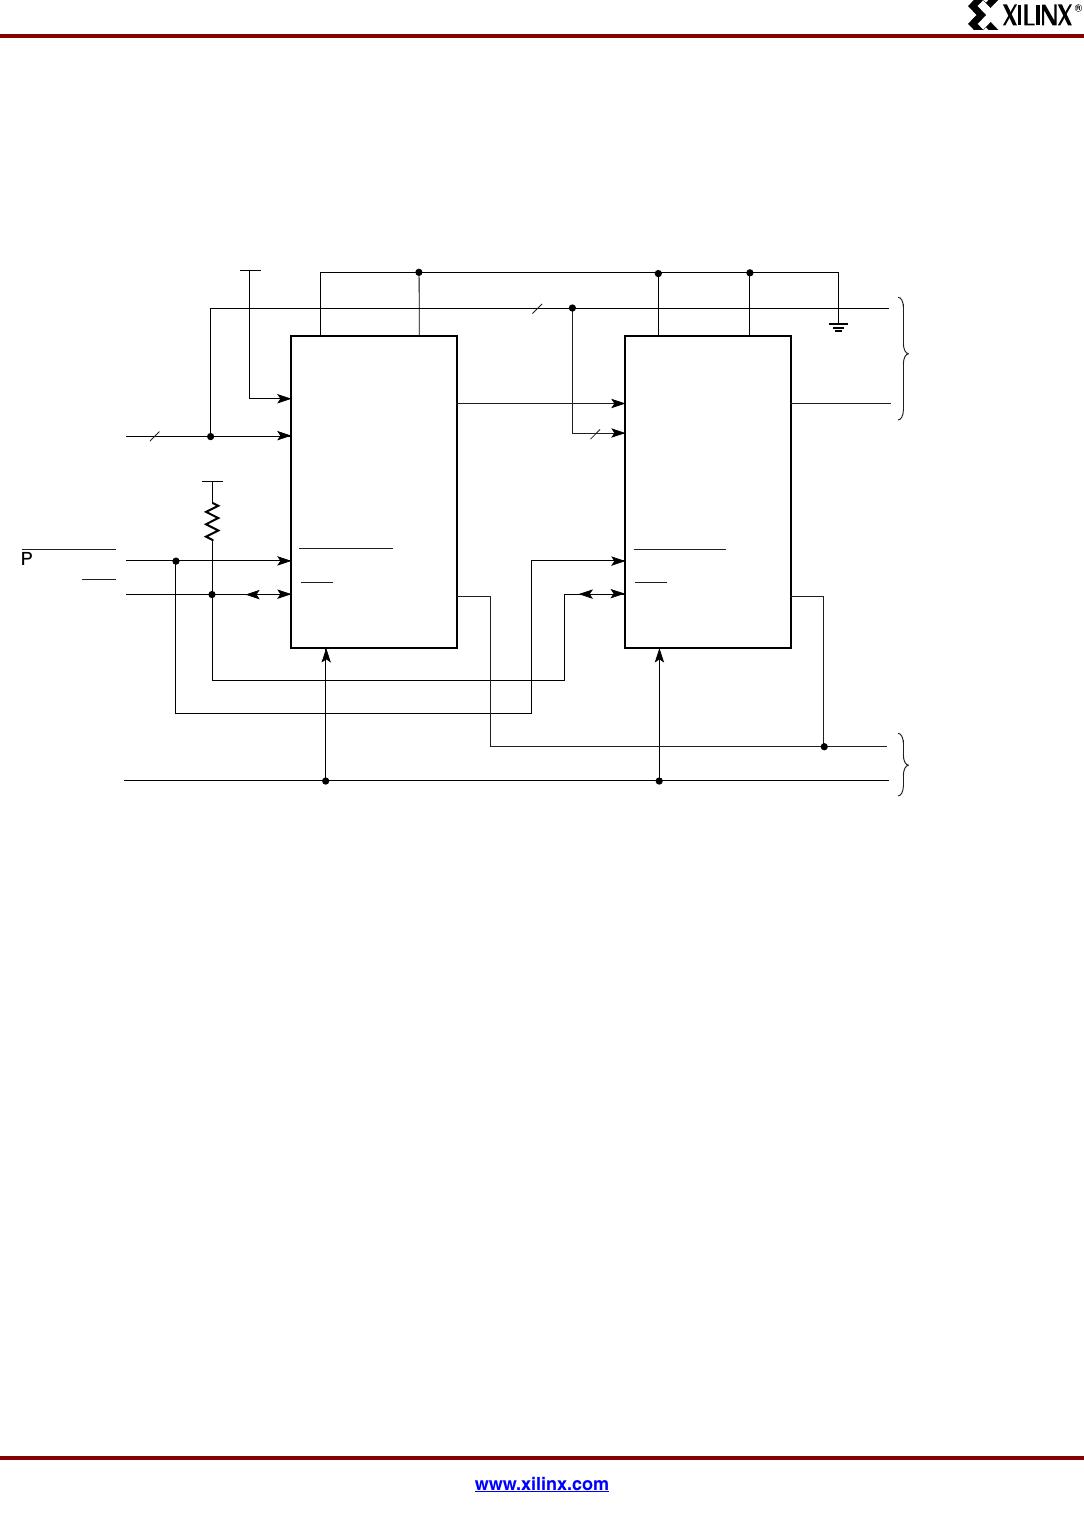 hight resolution of spartan and spartan xl fpga families data sheet